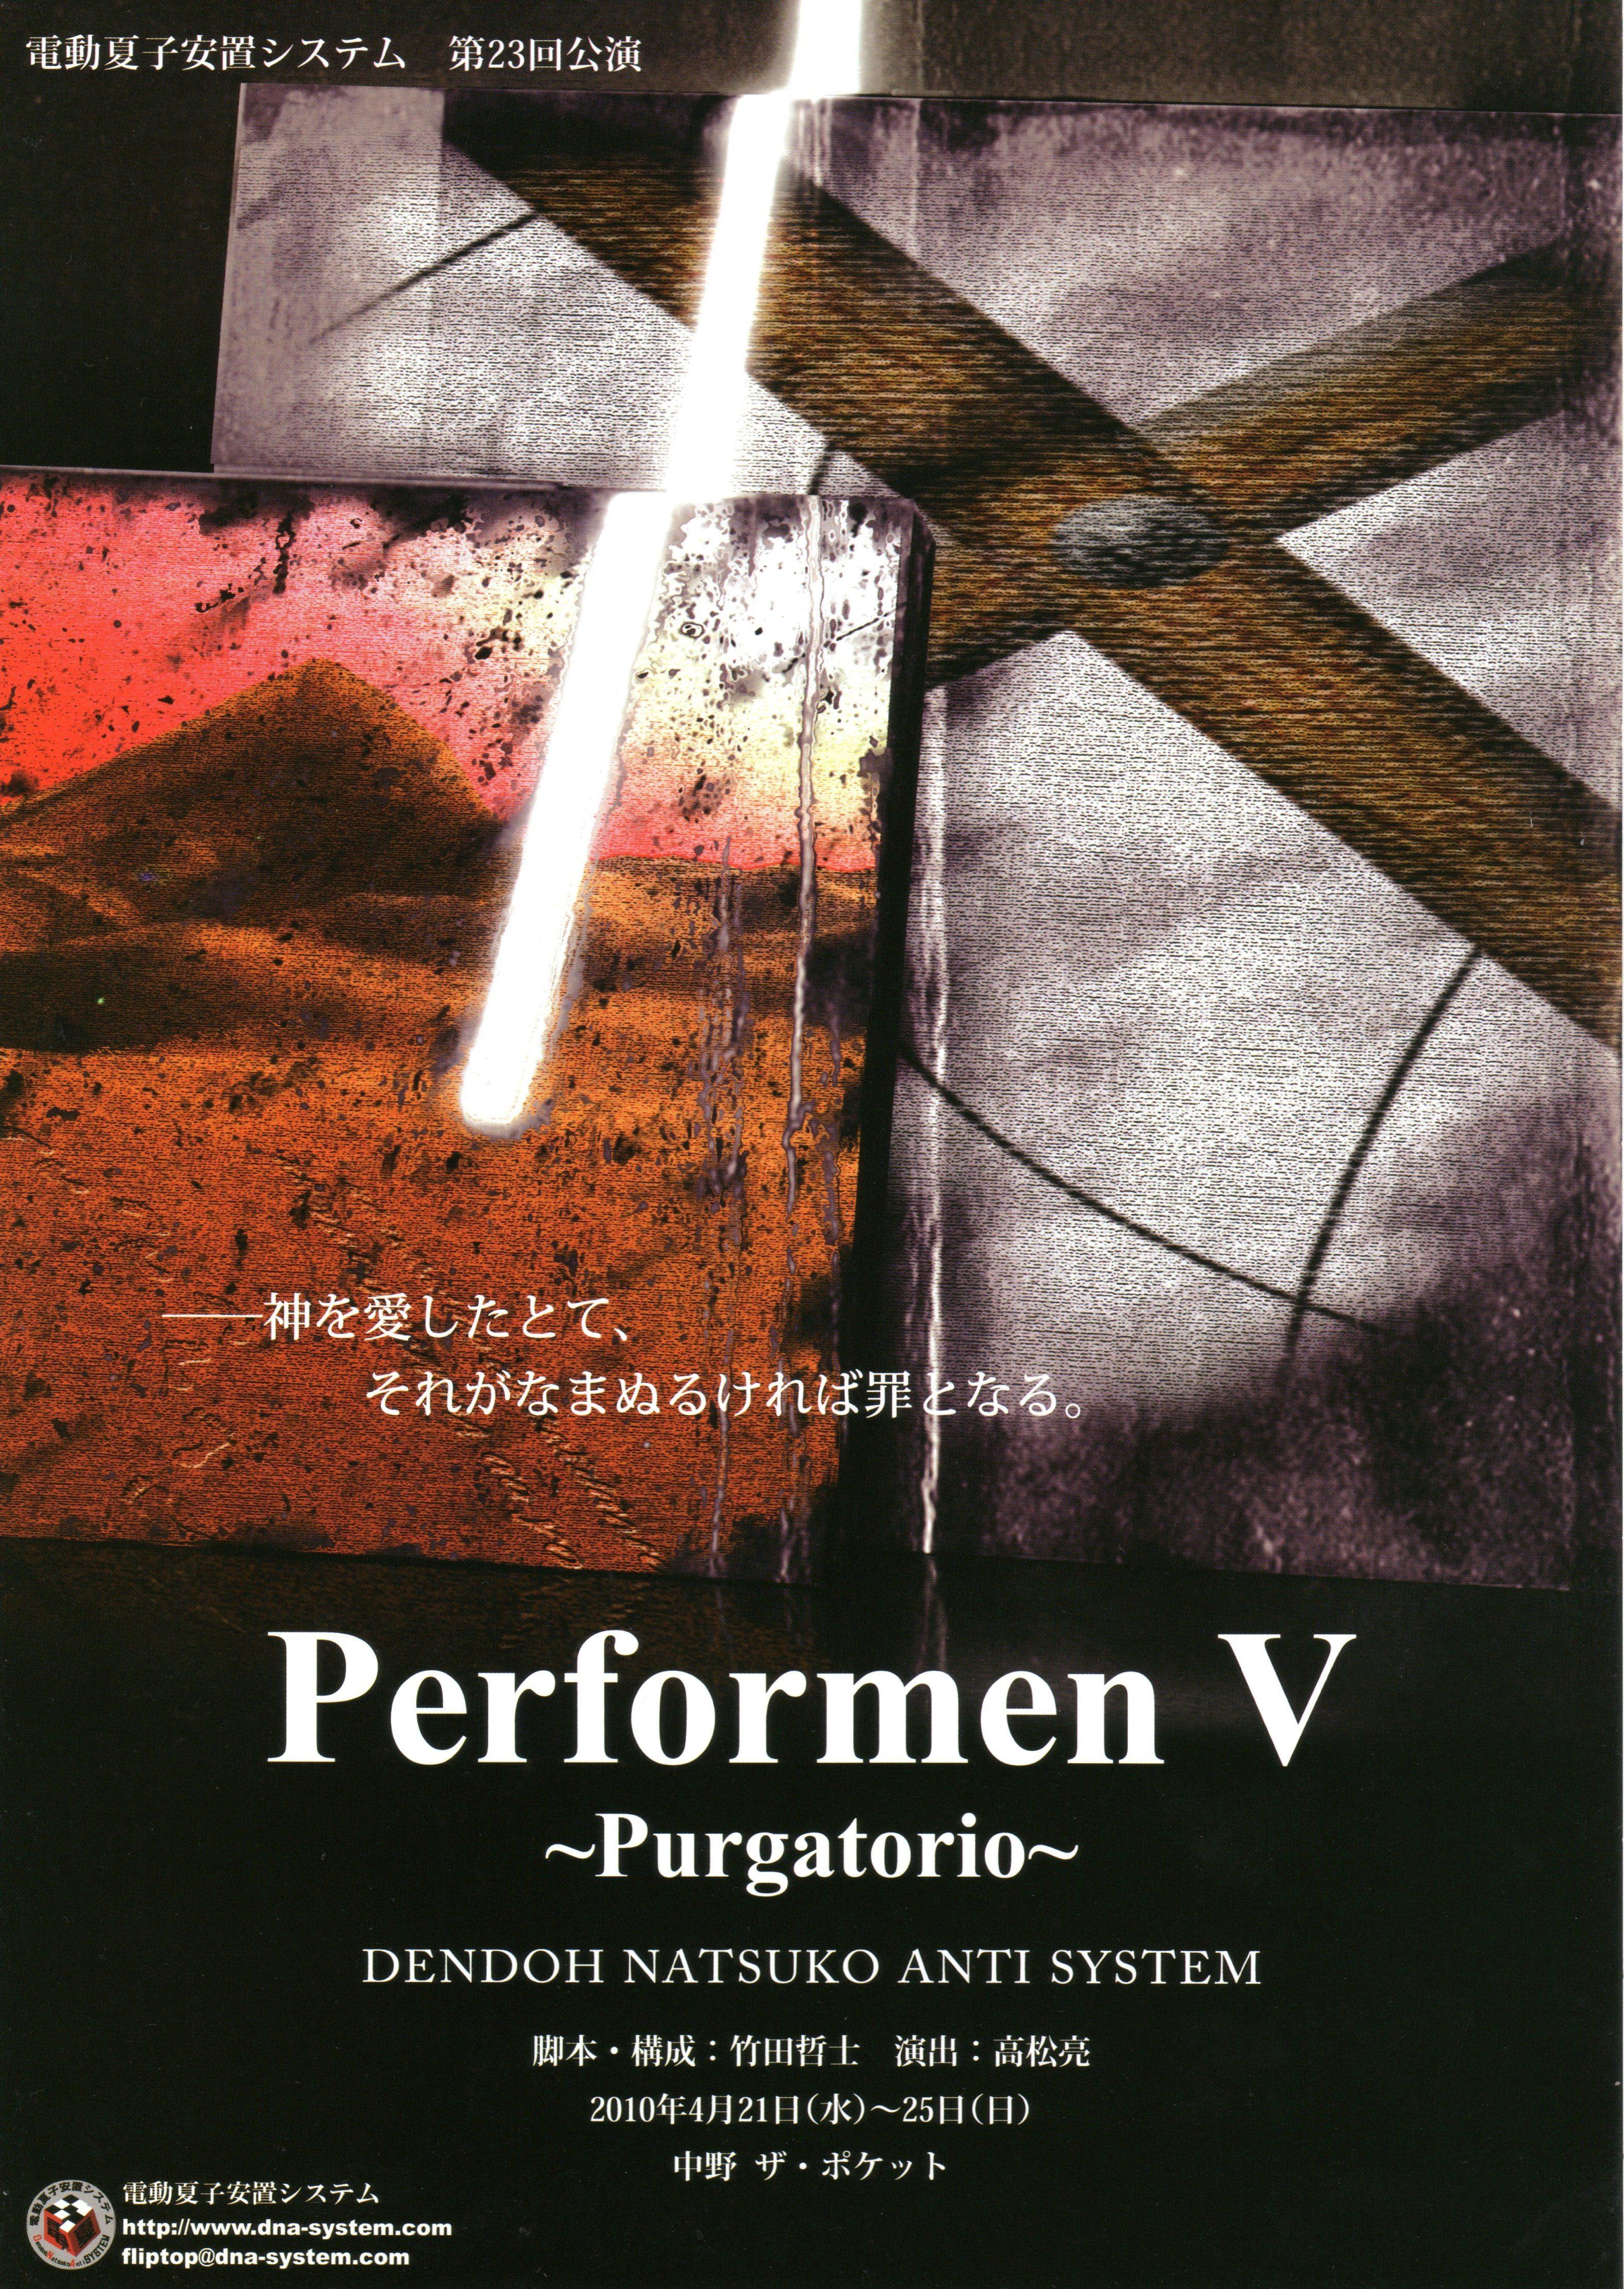 DVD 第23回公演『PerformenV~Purgatorio~』(フィーネ編/メンテ編 セット)